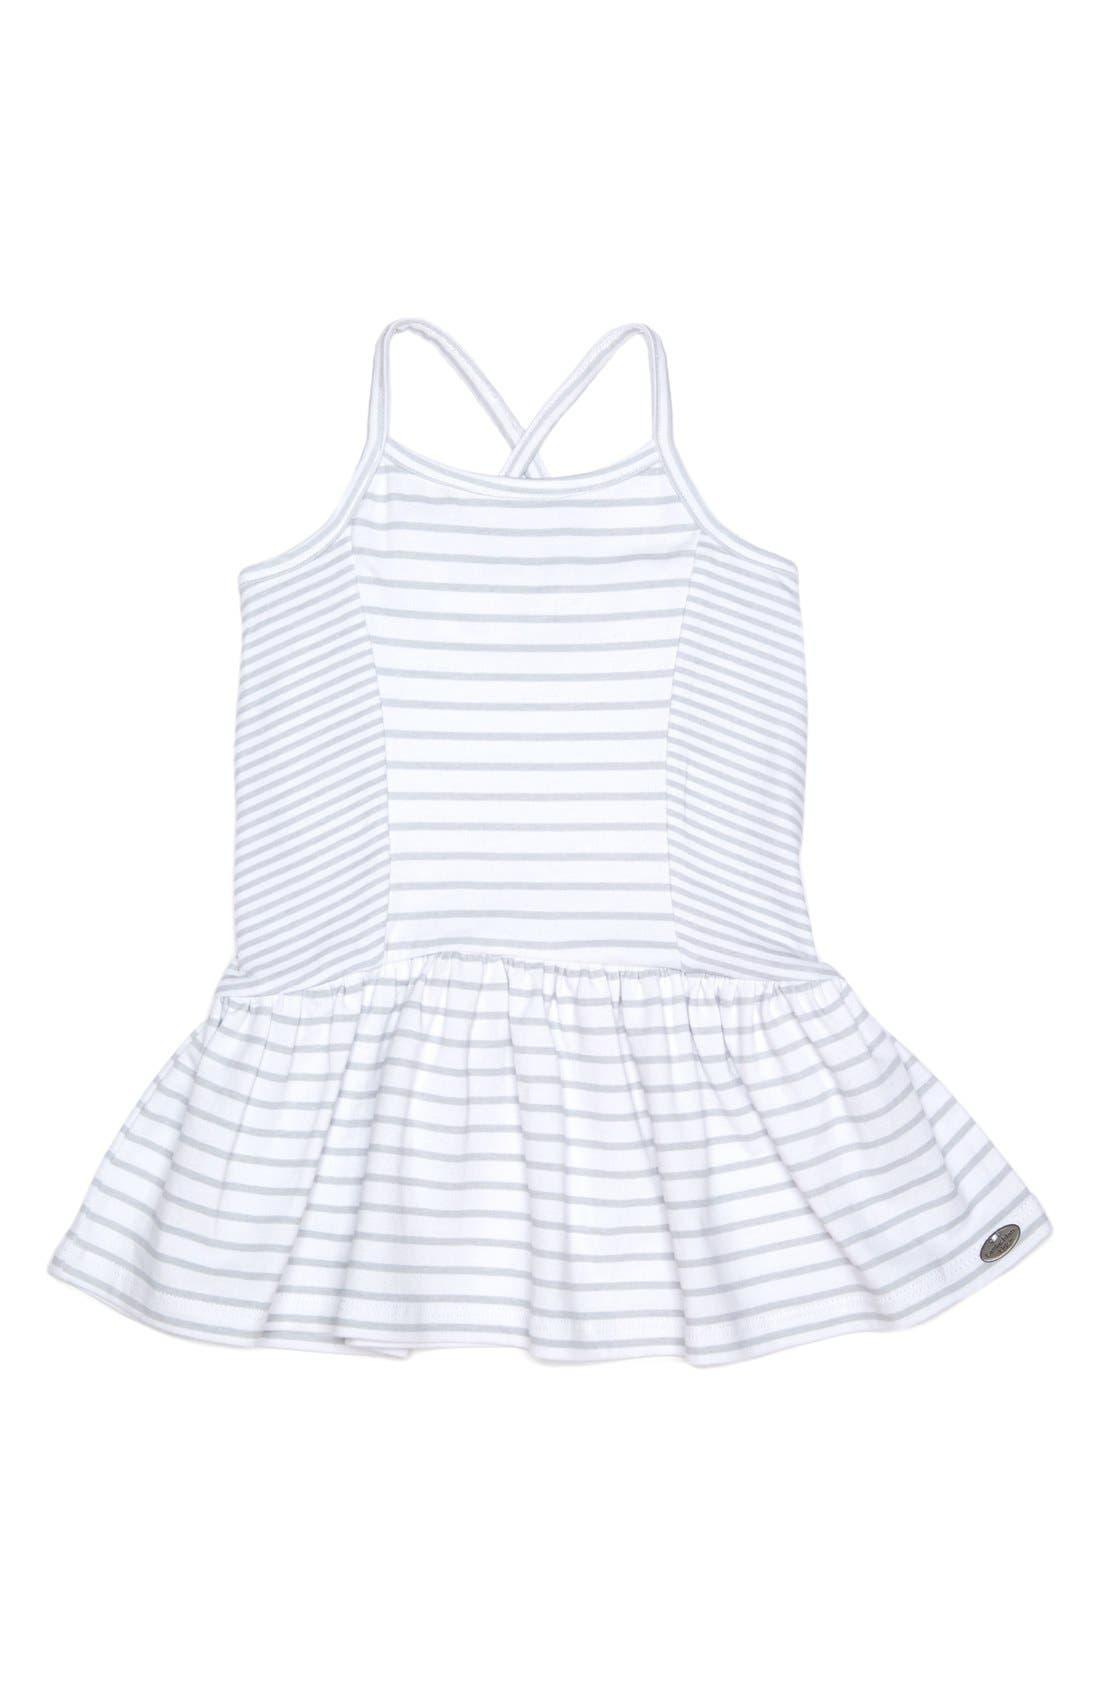 Stripe Sleeveless Dress,                             Main thumbnail 1, color,                             White/ Grey